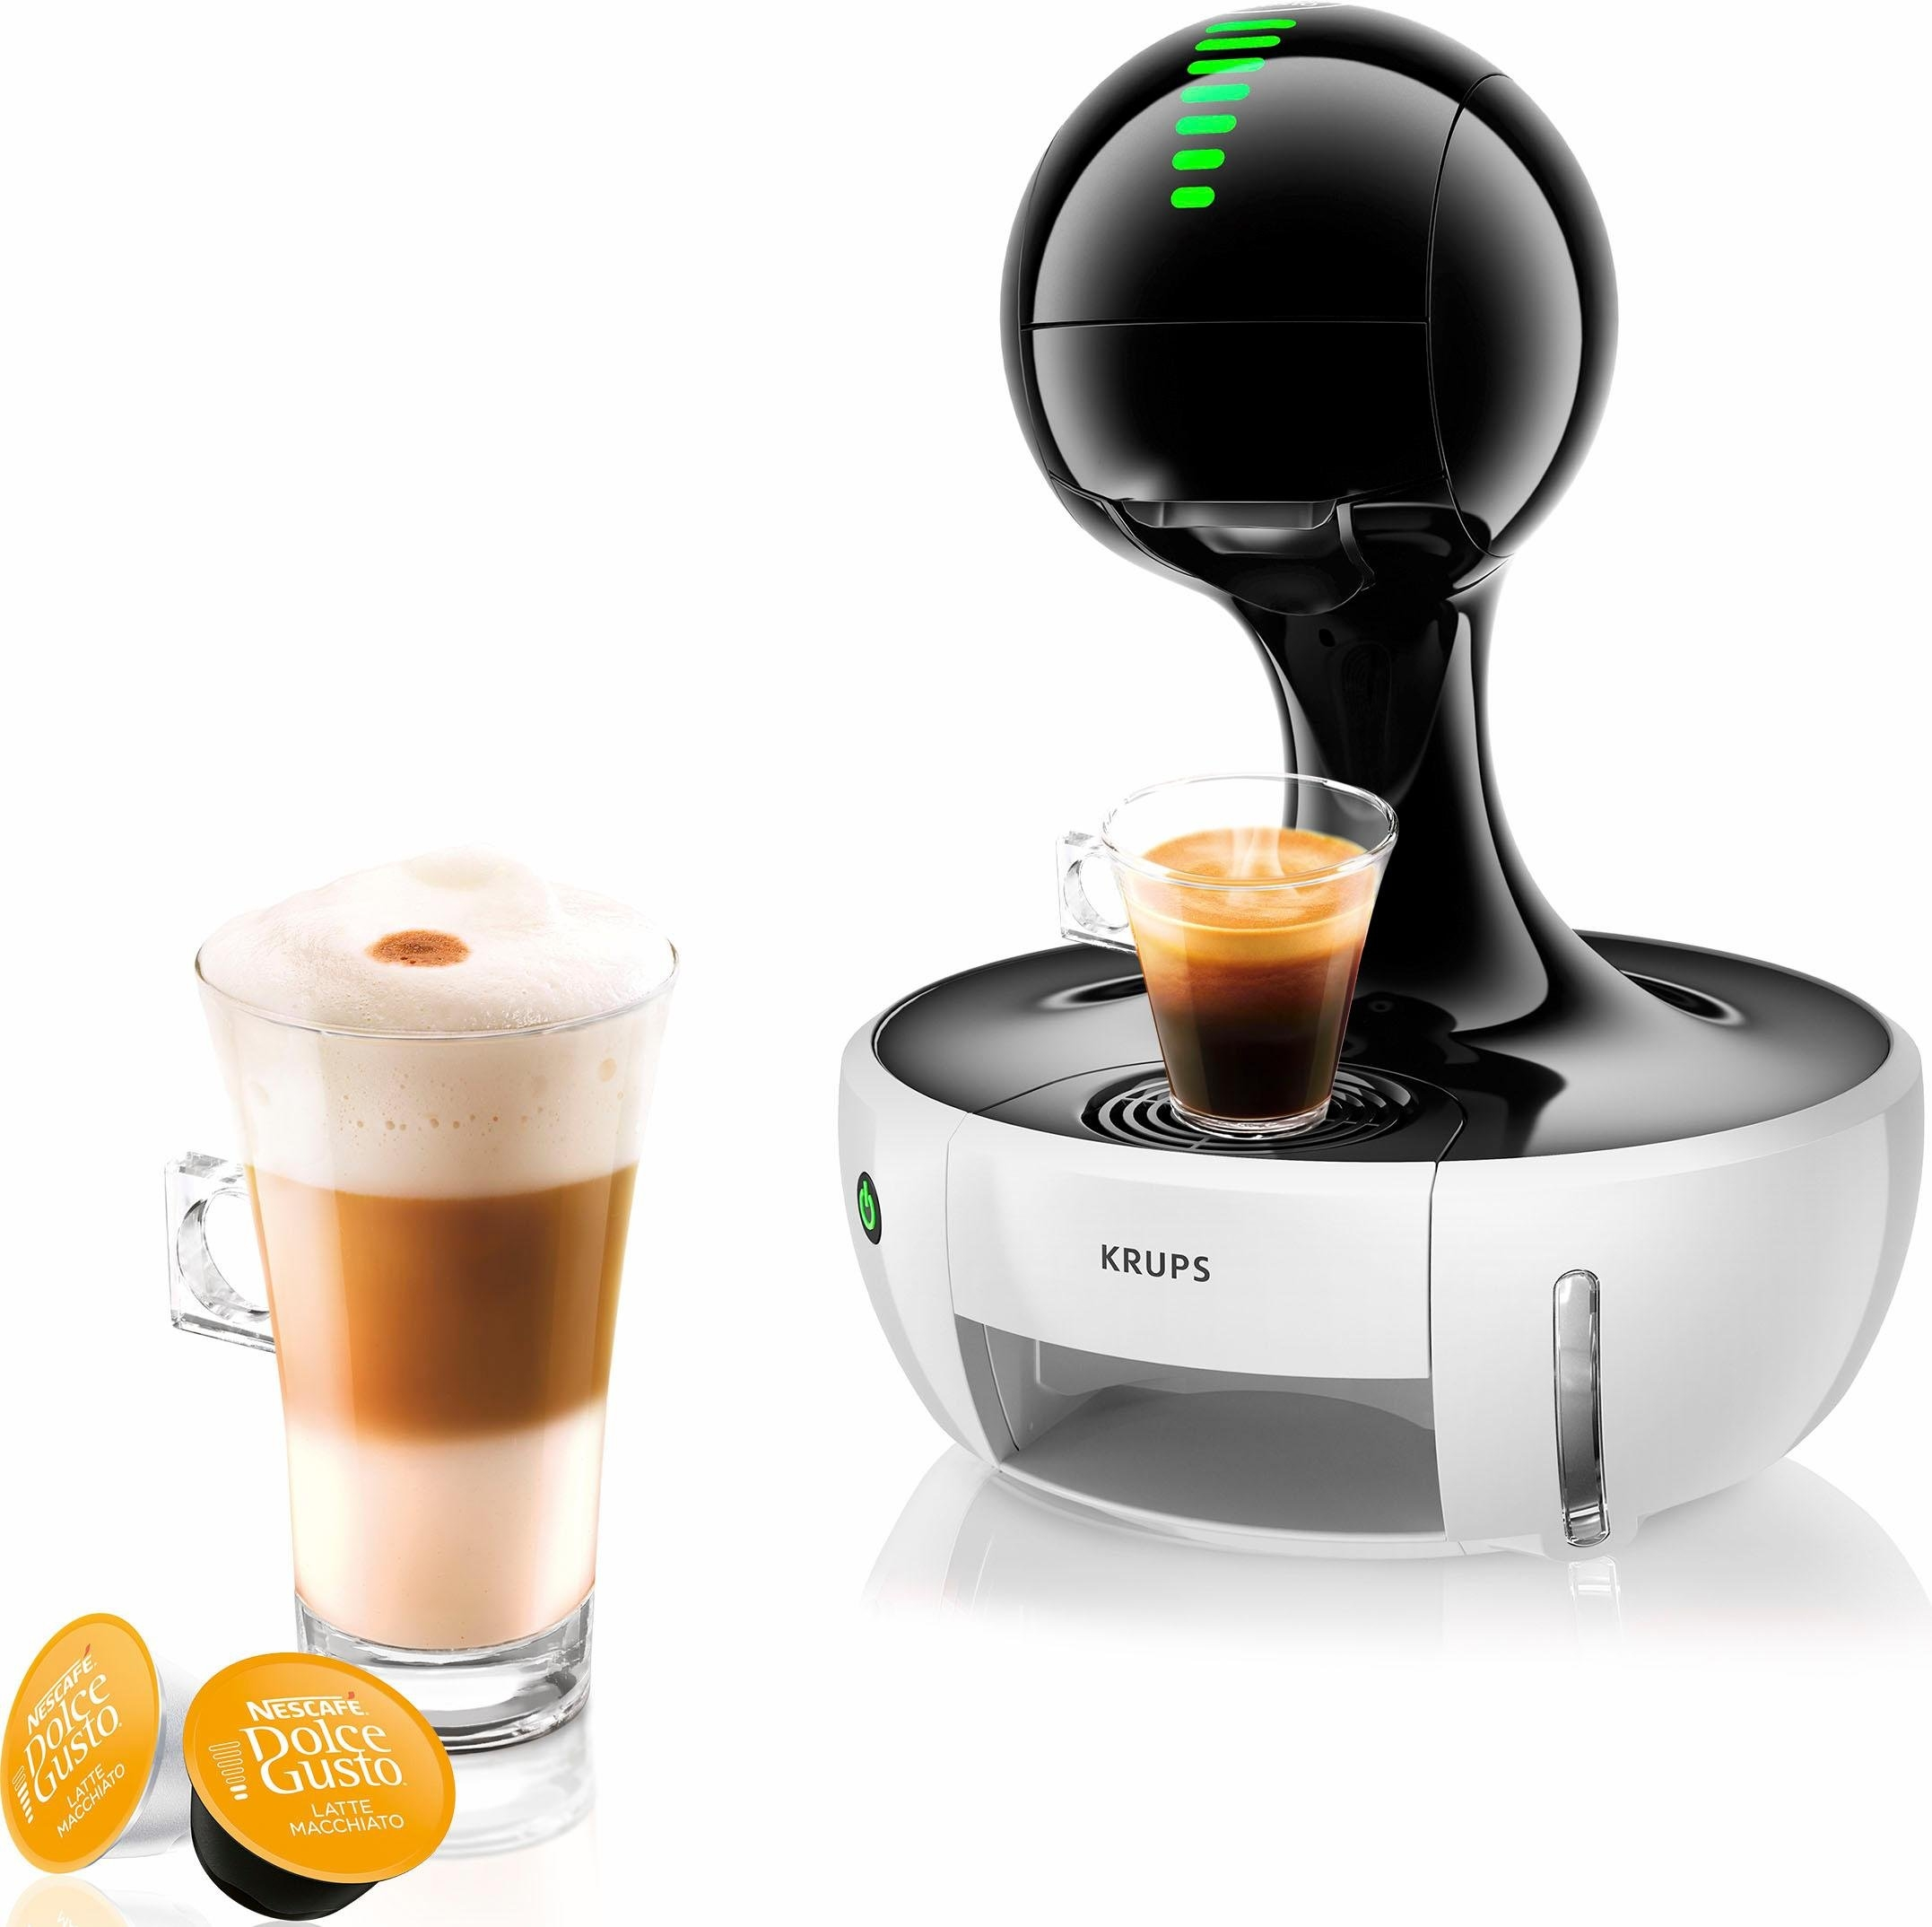 Nescafé Dolce Gusto Krups NESCAFÉ® Dolce Gusto® Koffiecapsulemachine Drop KP3505, rood/zwart online kopen op otto.nl